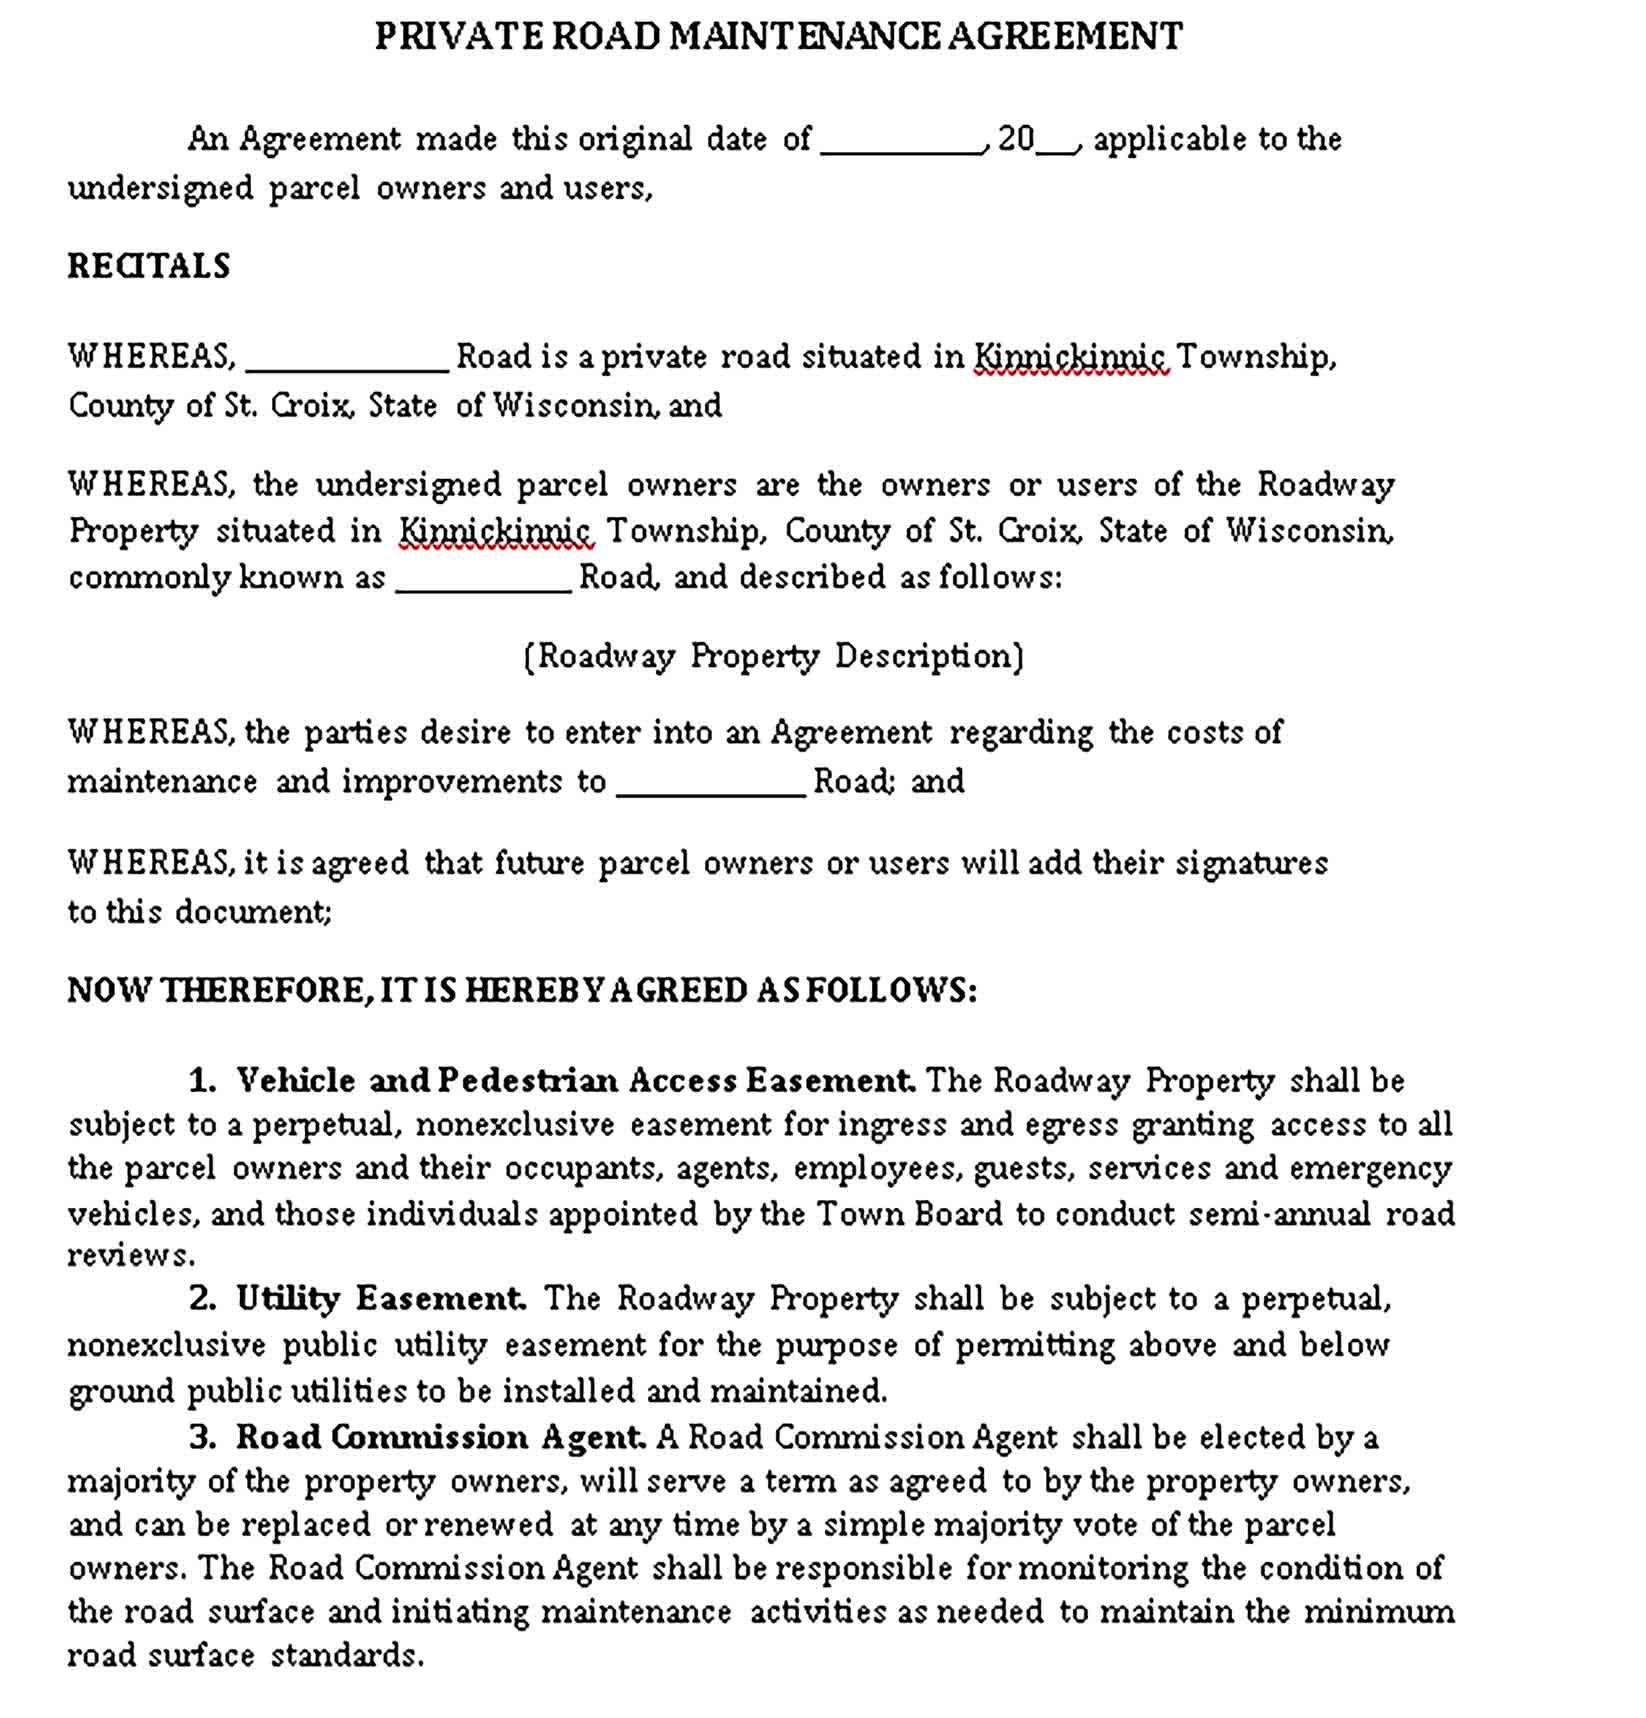 Maintenance Agreement Templates Sample Maintenance Agreement Contract Template Private road maintenance agreement template